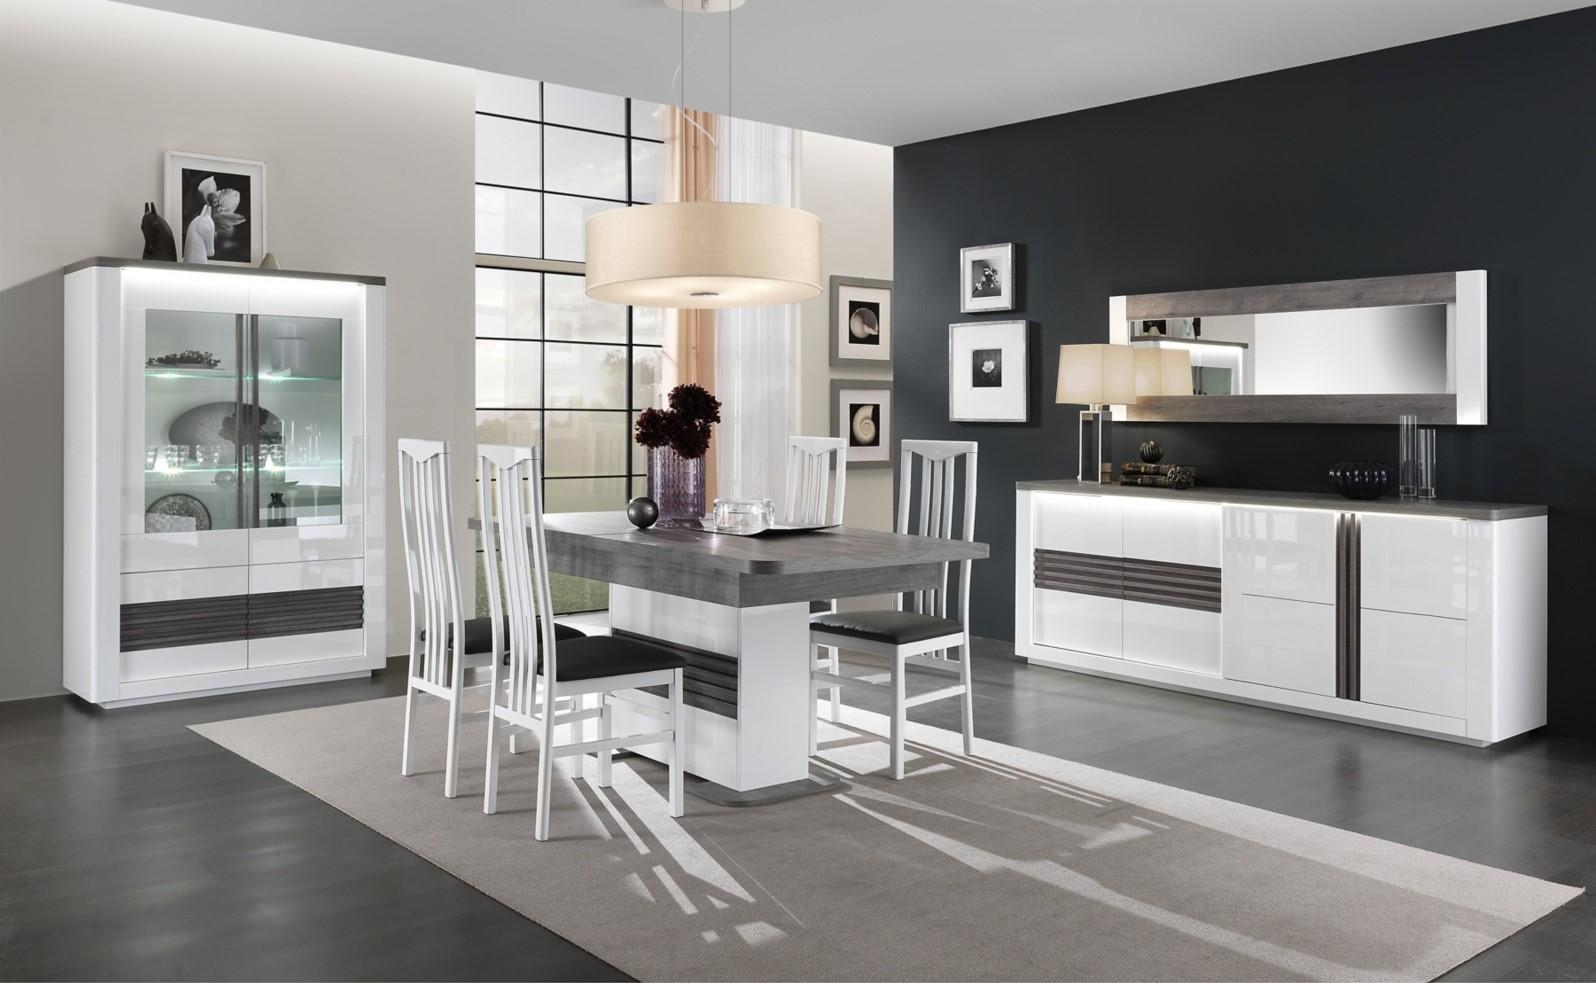 Table L180 All Vertigo Blanc Chene Gris Pas Cher Table But